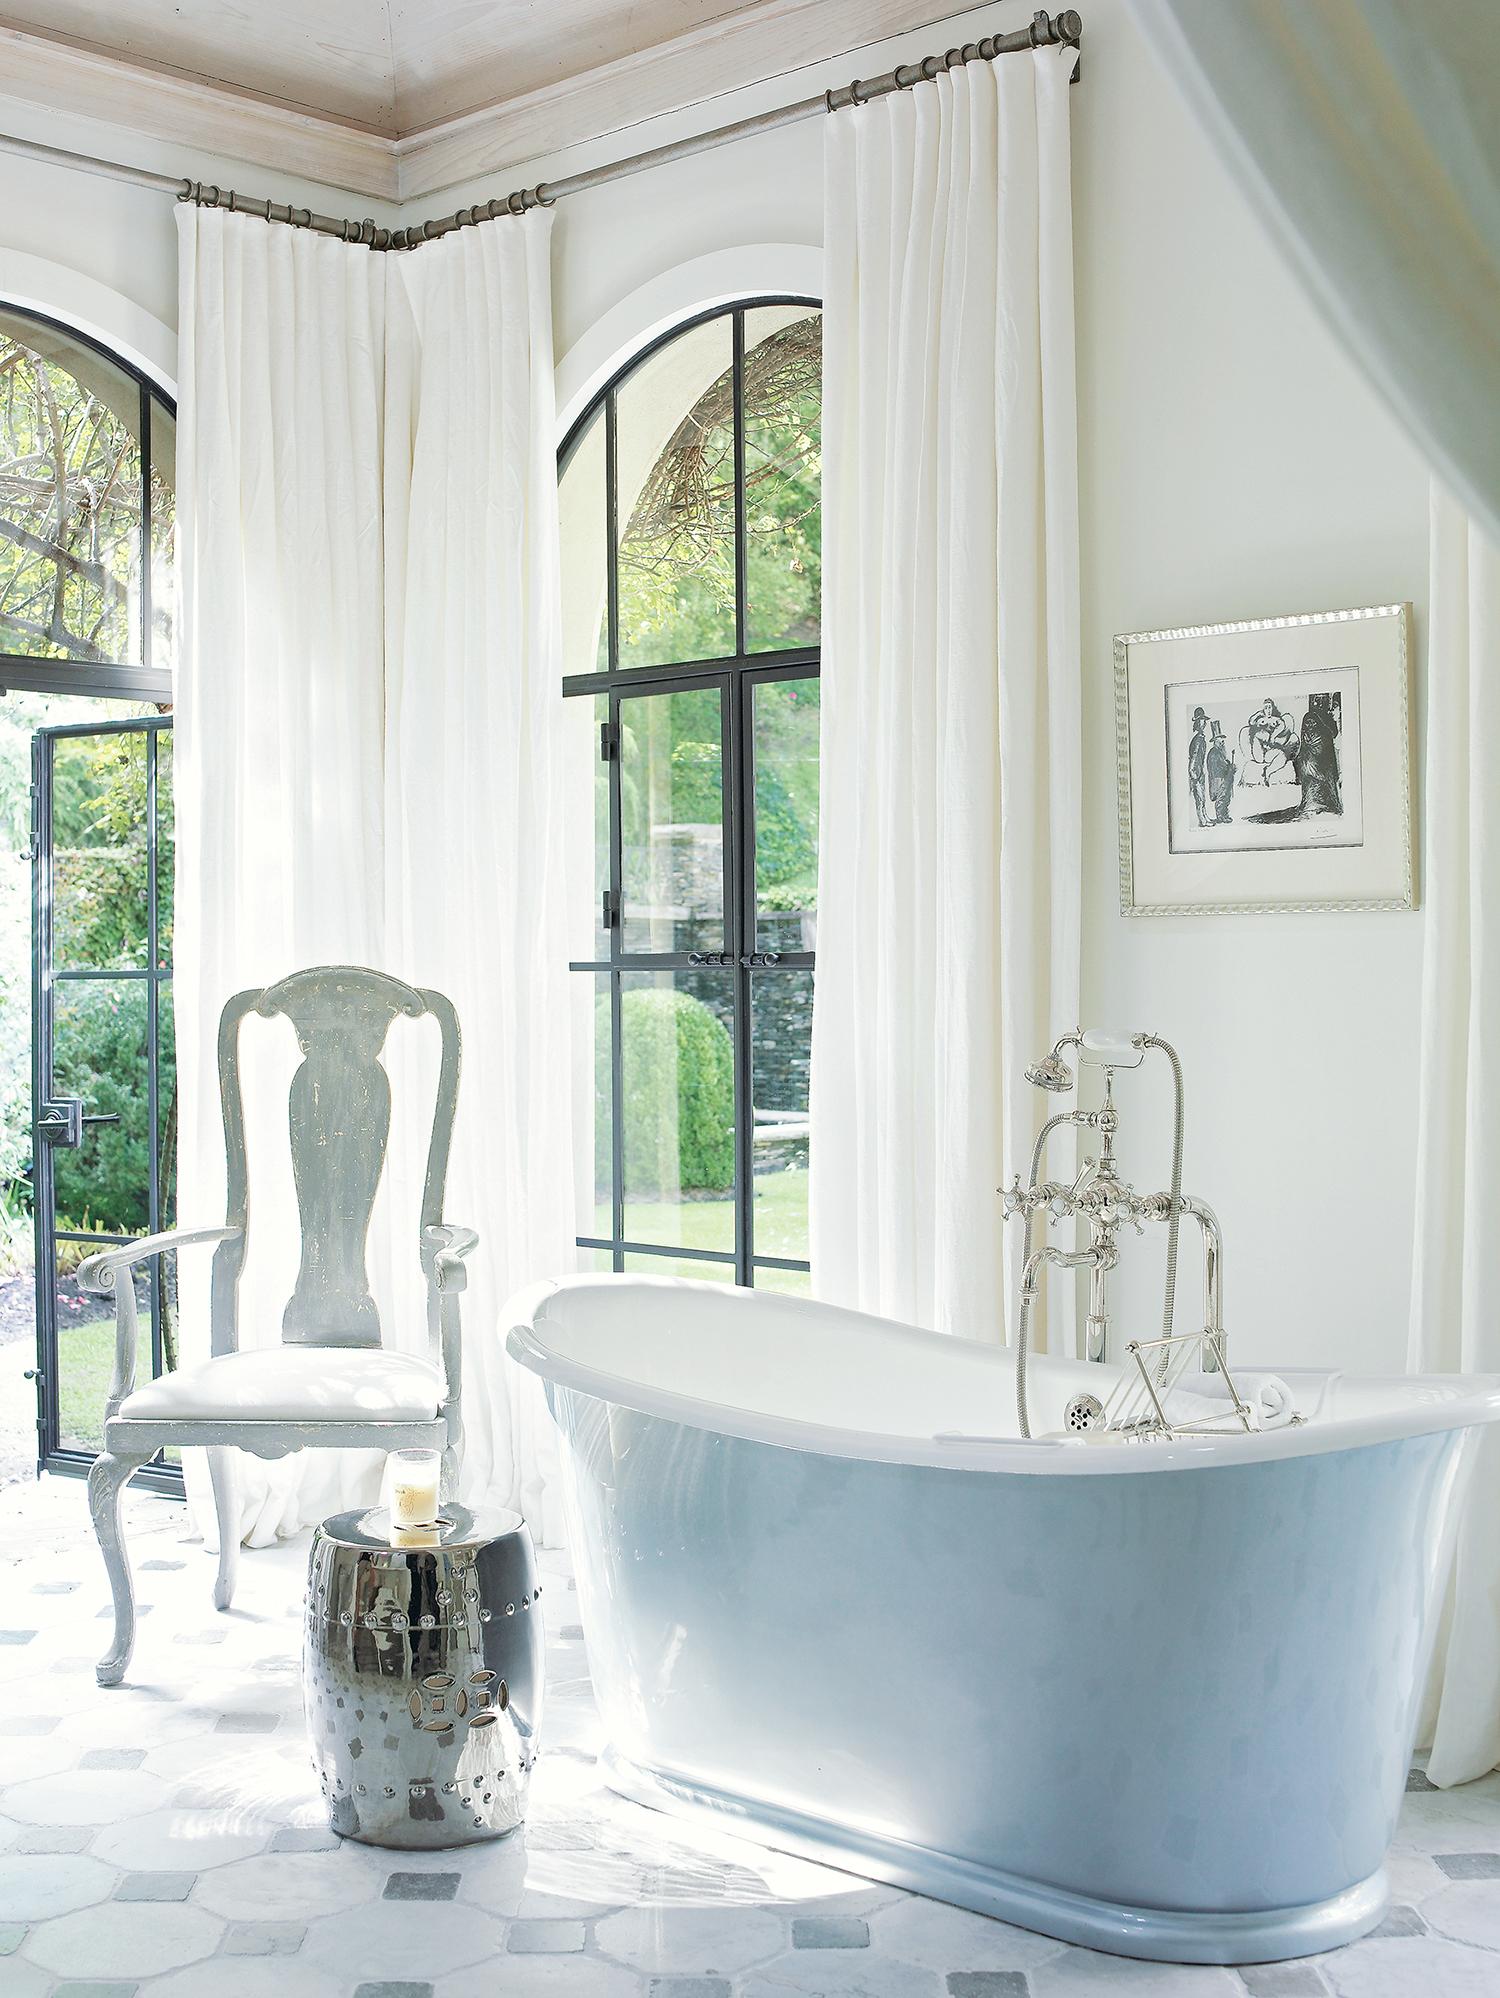 Design The Perfect Bath - Webb bathroom design